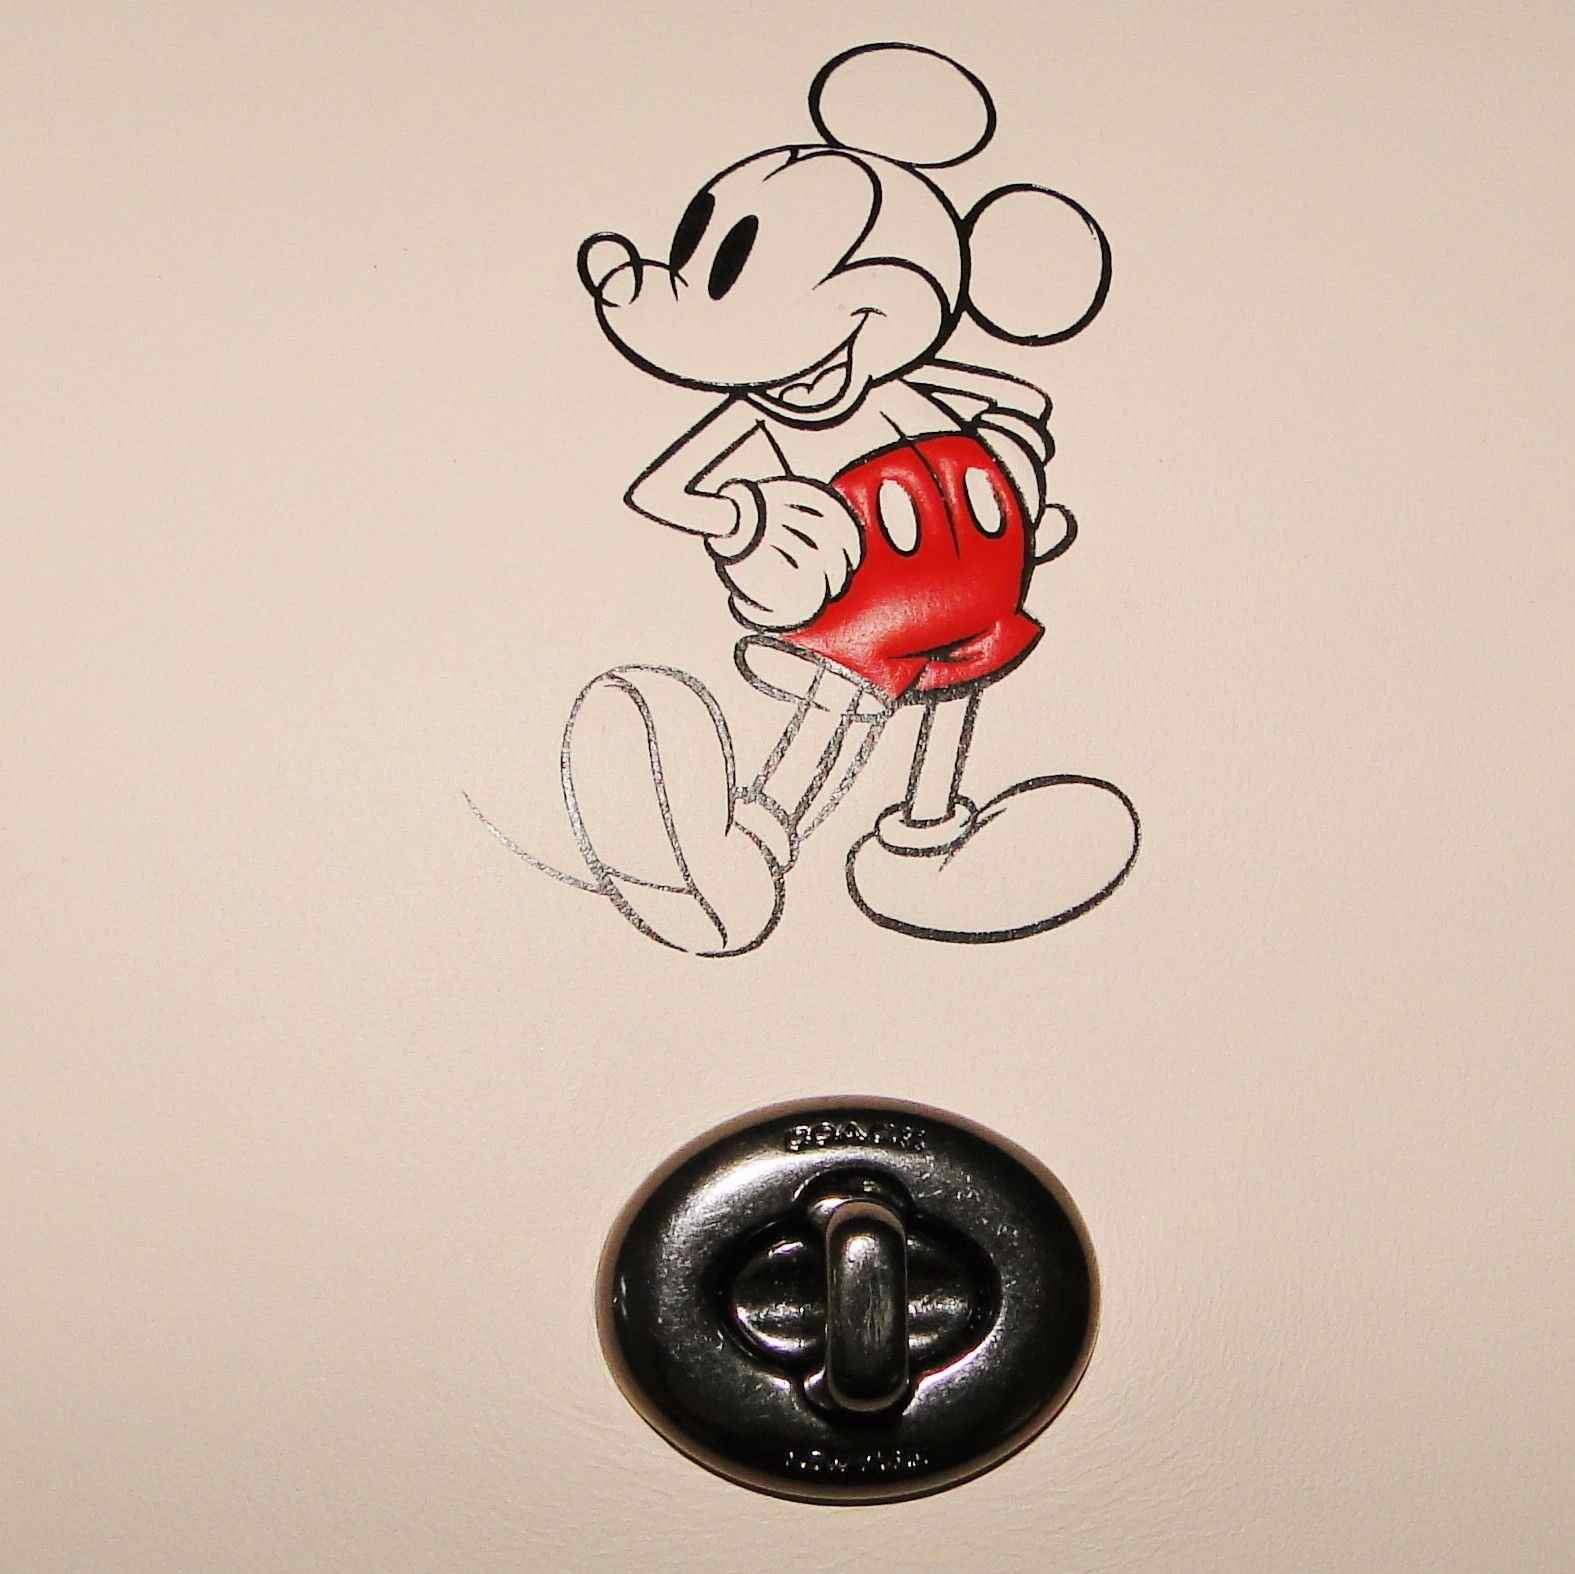 Coach Disney Mickey Mouse Penny Purse Crossbody Bag Chalk